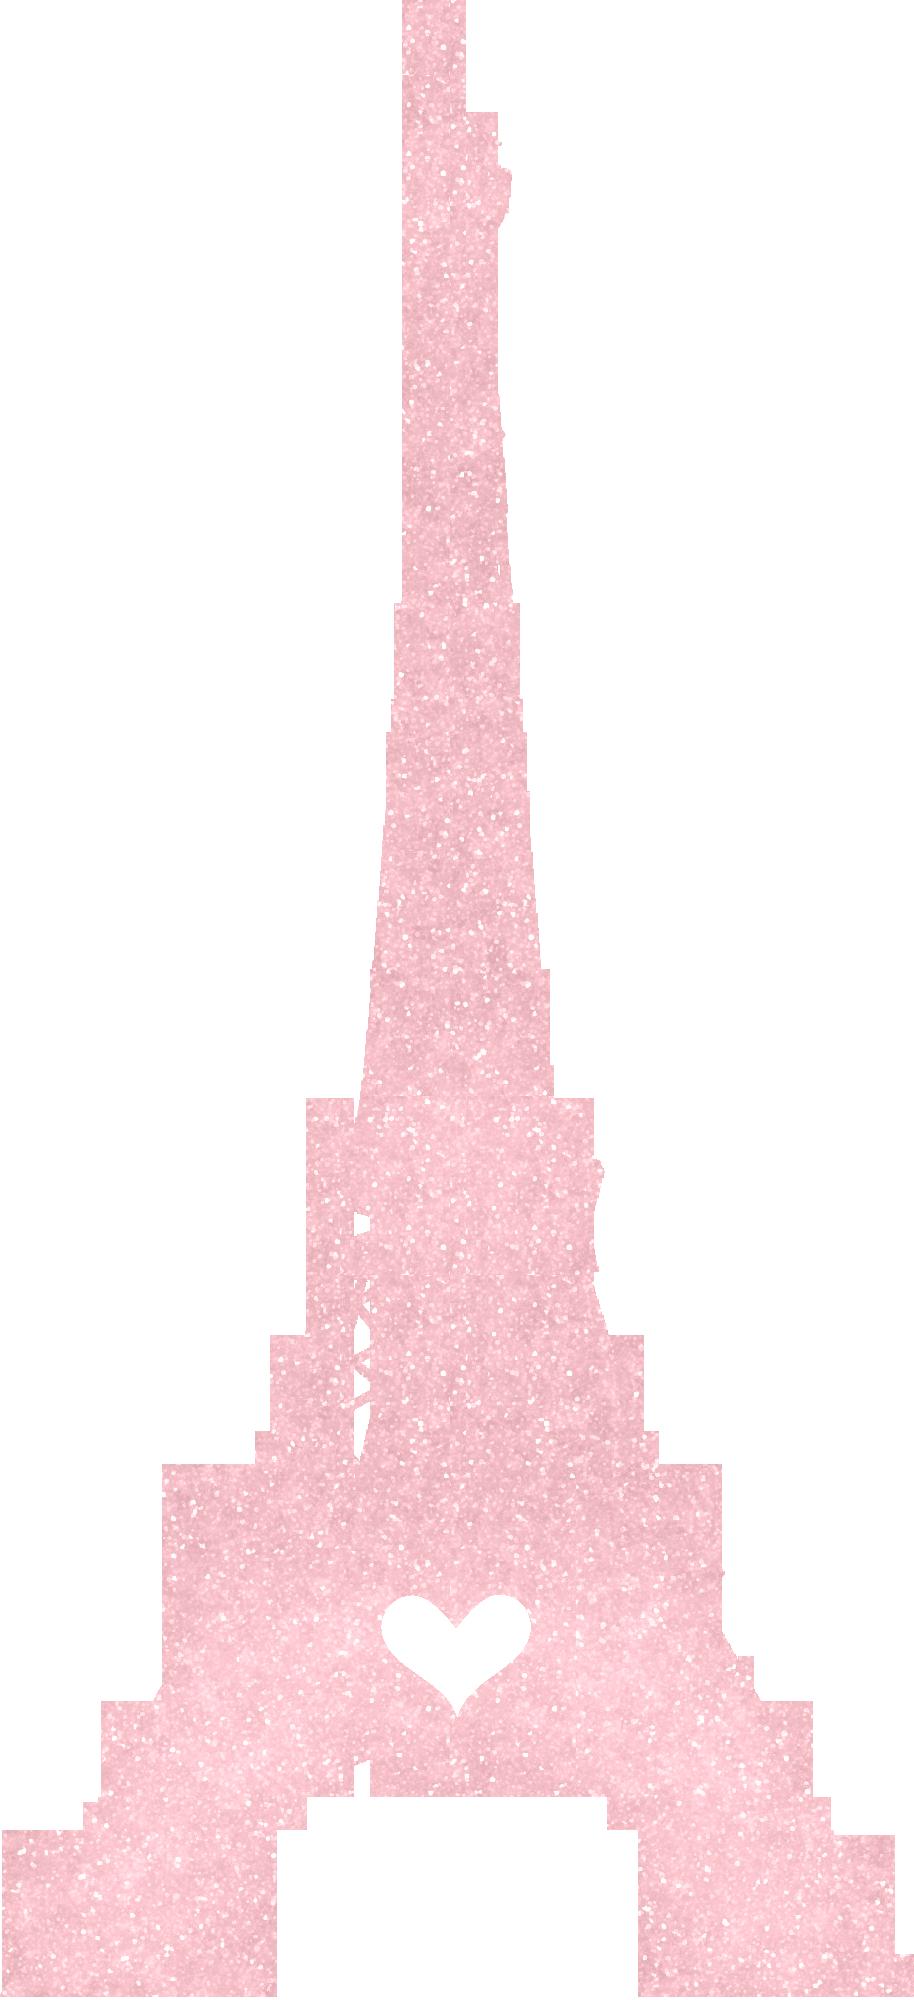 Tborges ohsnap tower png. Paris clipart pink